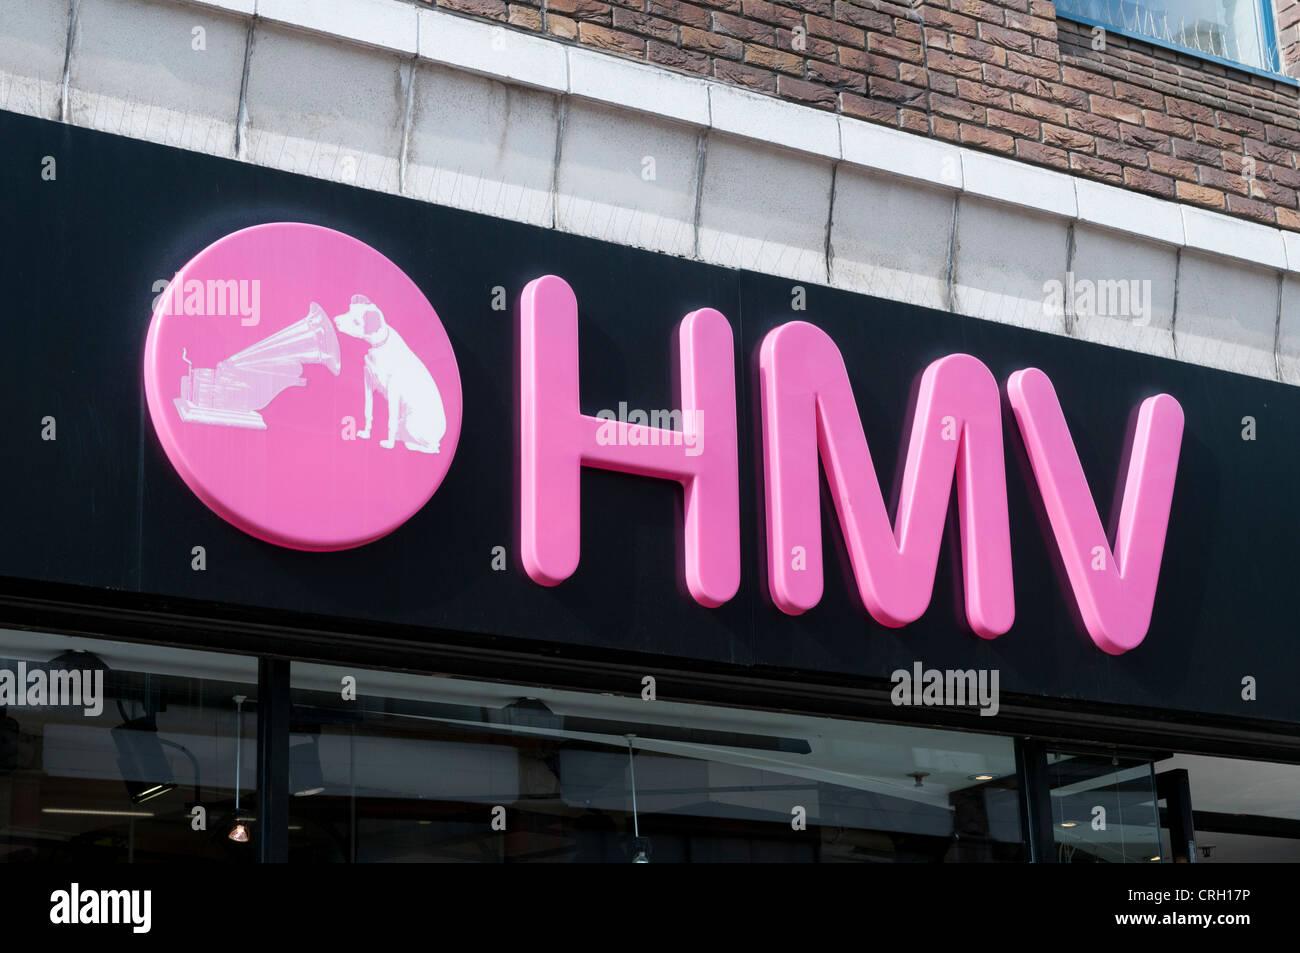 HMV store logo - Stock Image